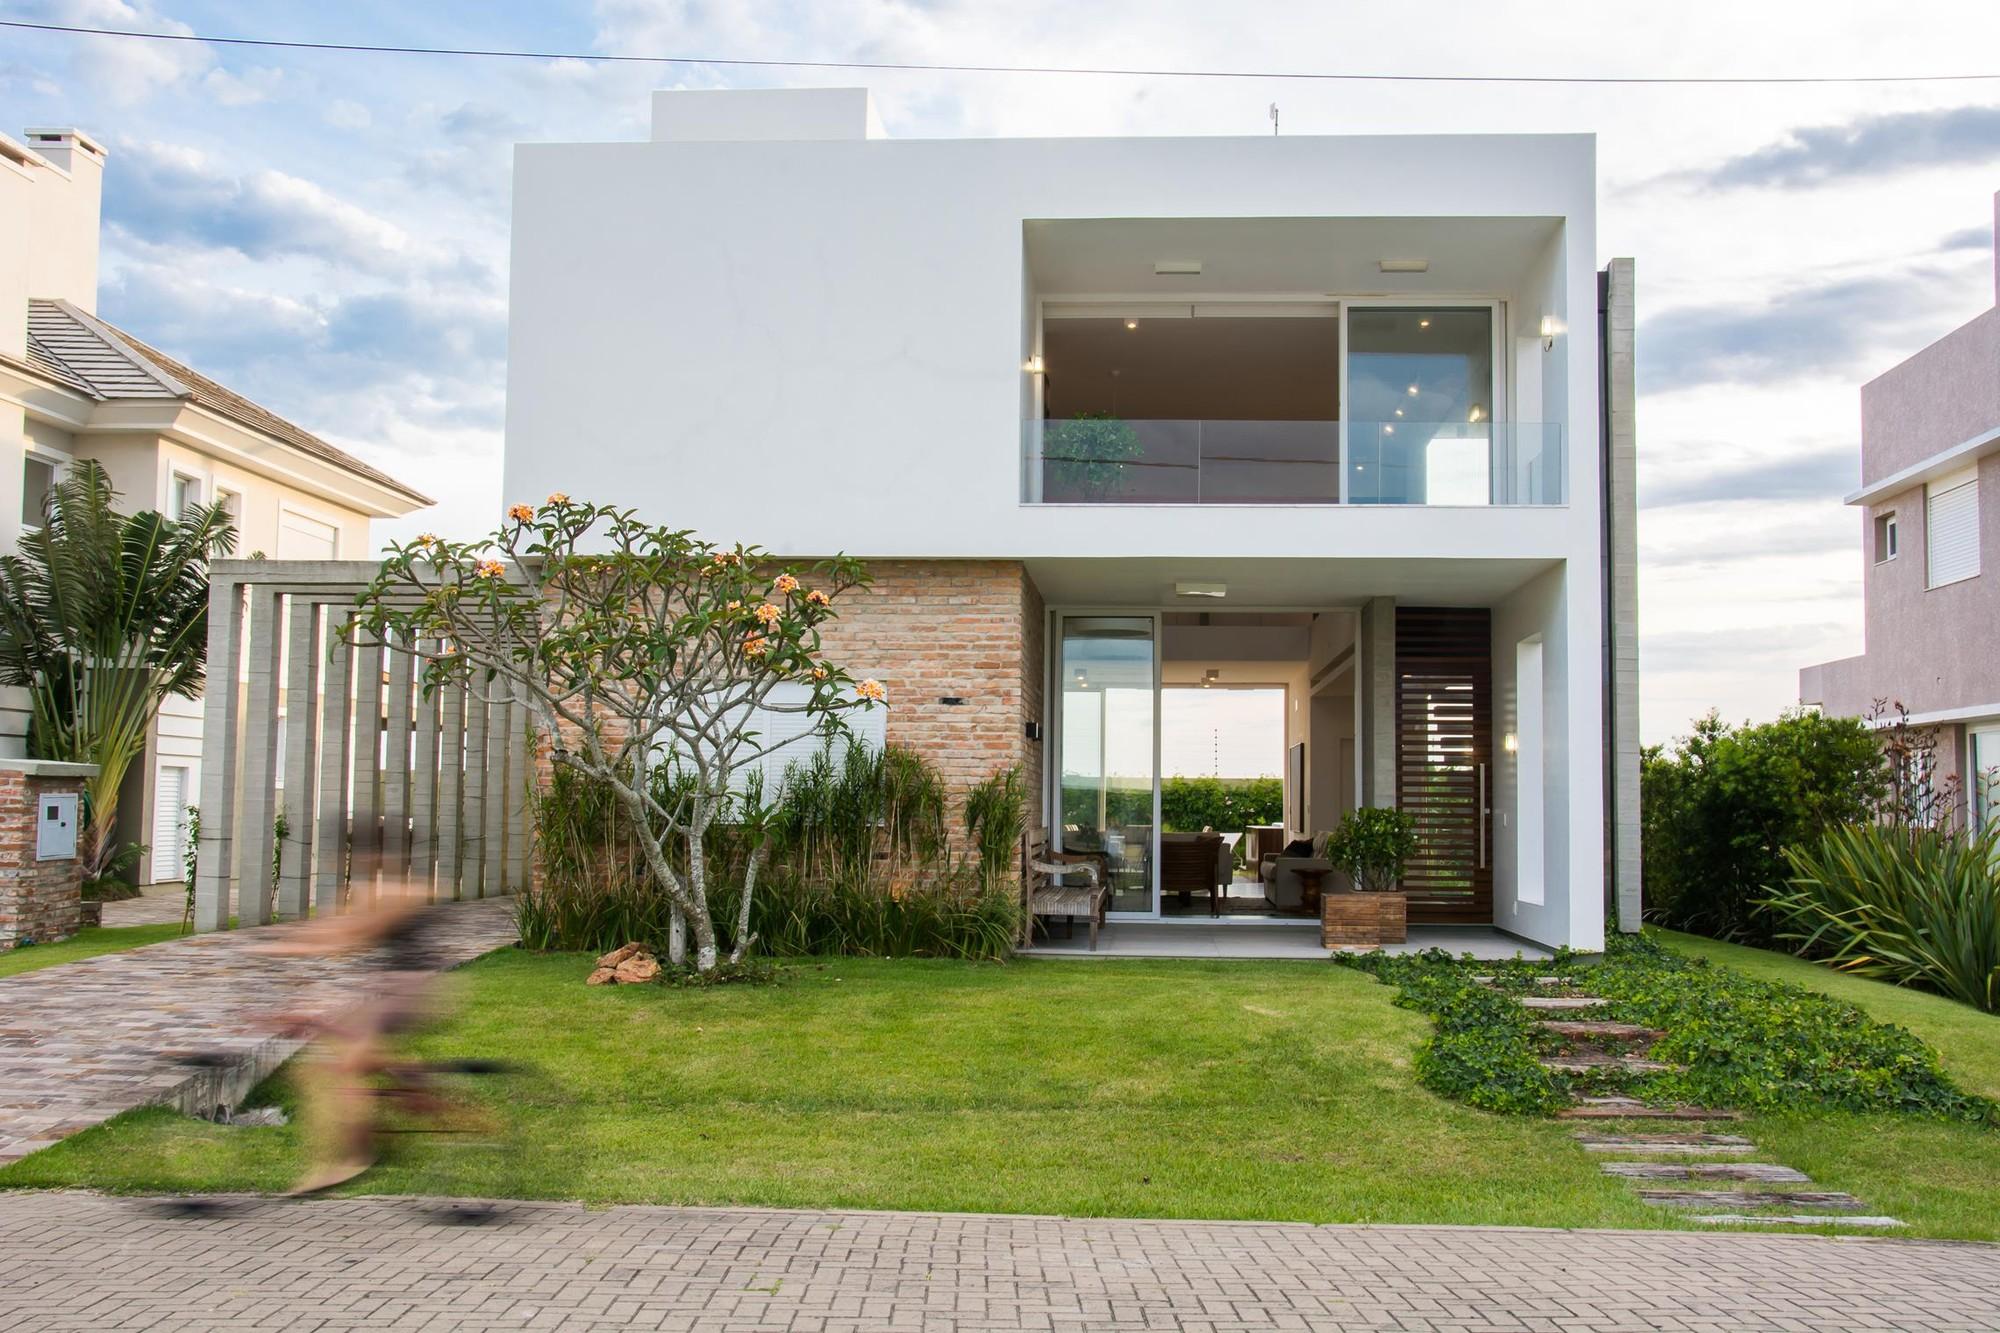 Casa Ventura M22 Sbardelotto Arquitetura Archdaily Brasil